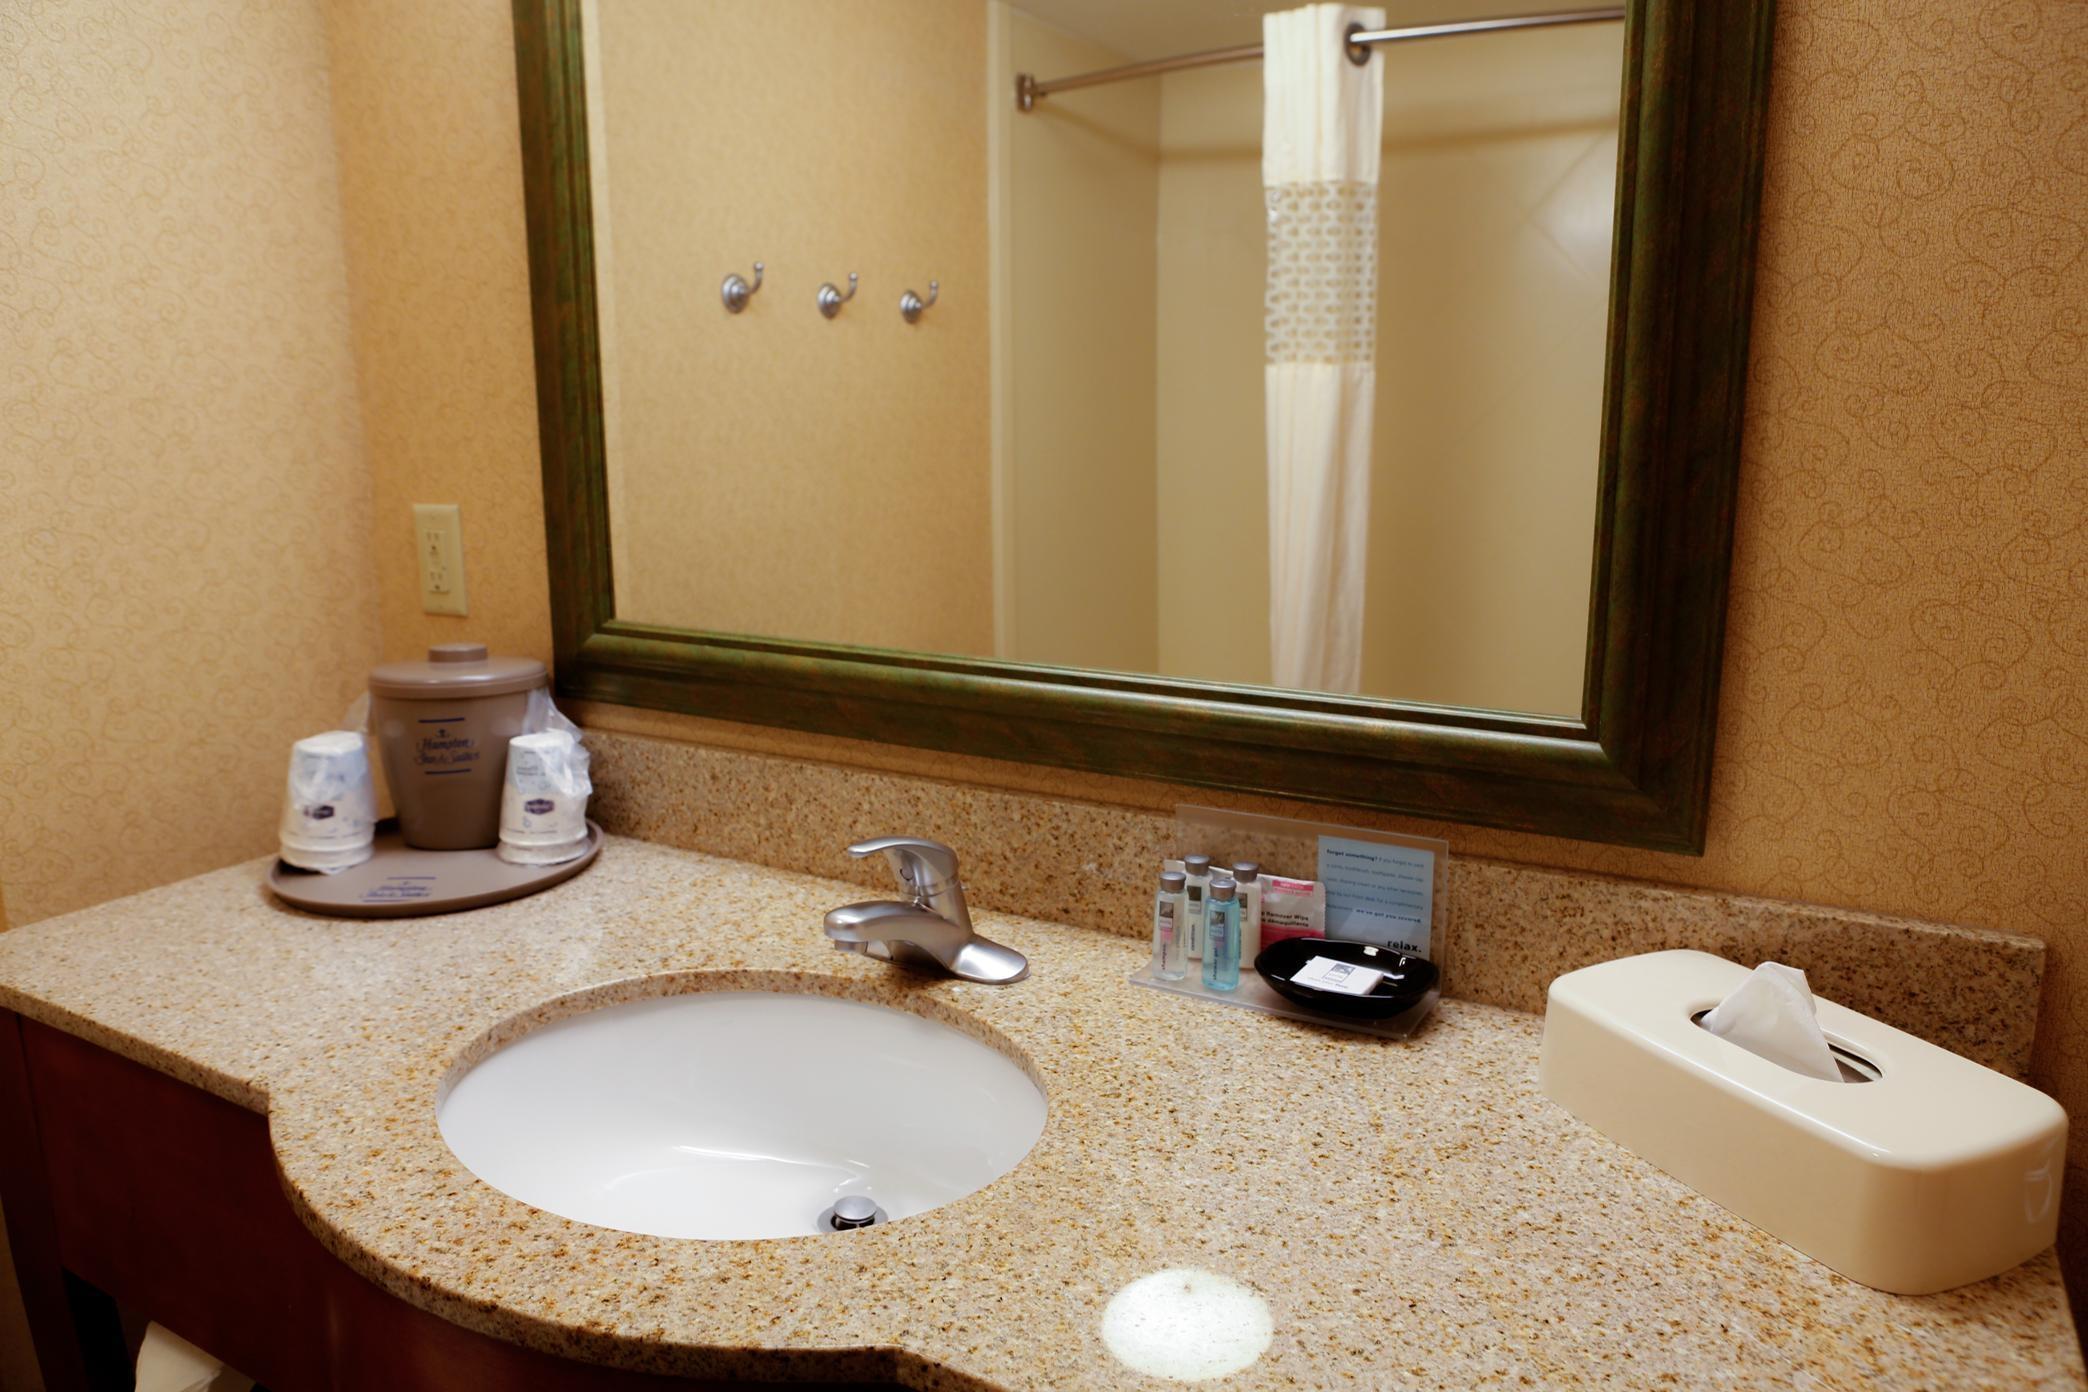 Hampton Inn & Suites Greenfield image 15